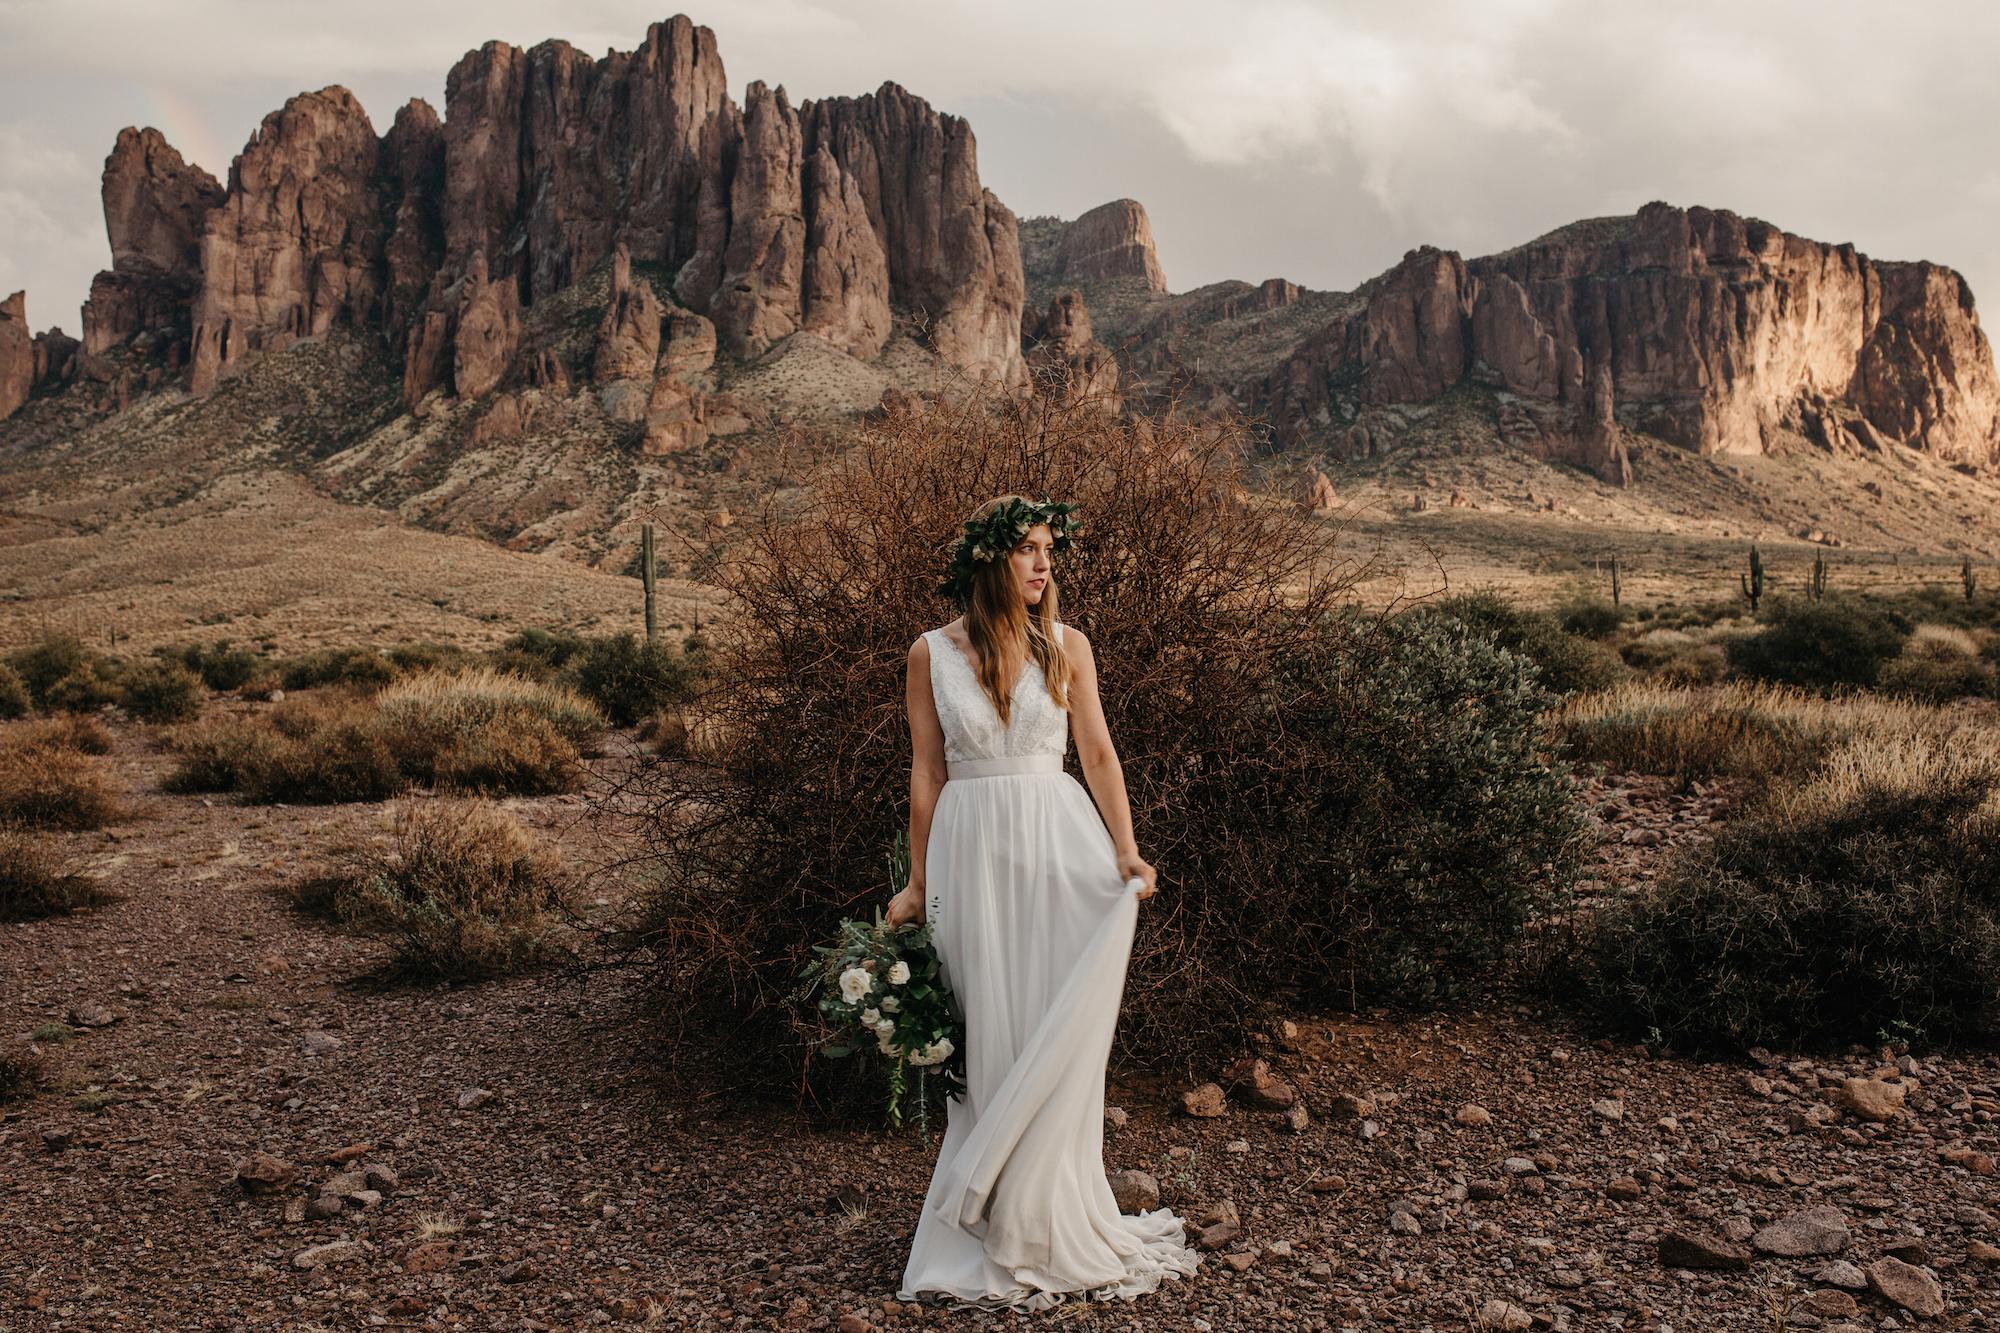 arizona - wedding - photographer803.jpg